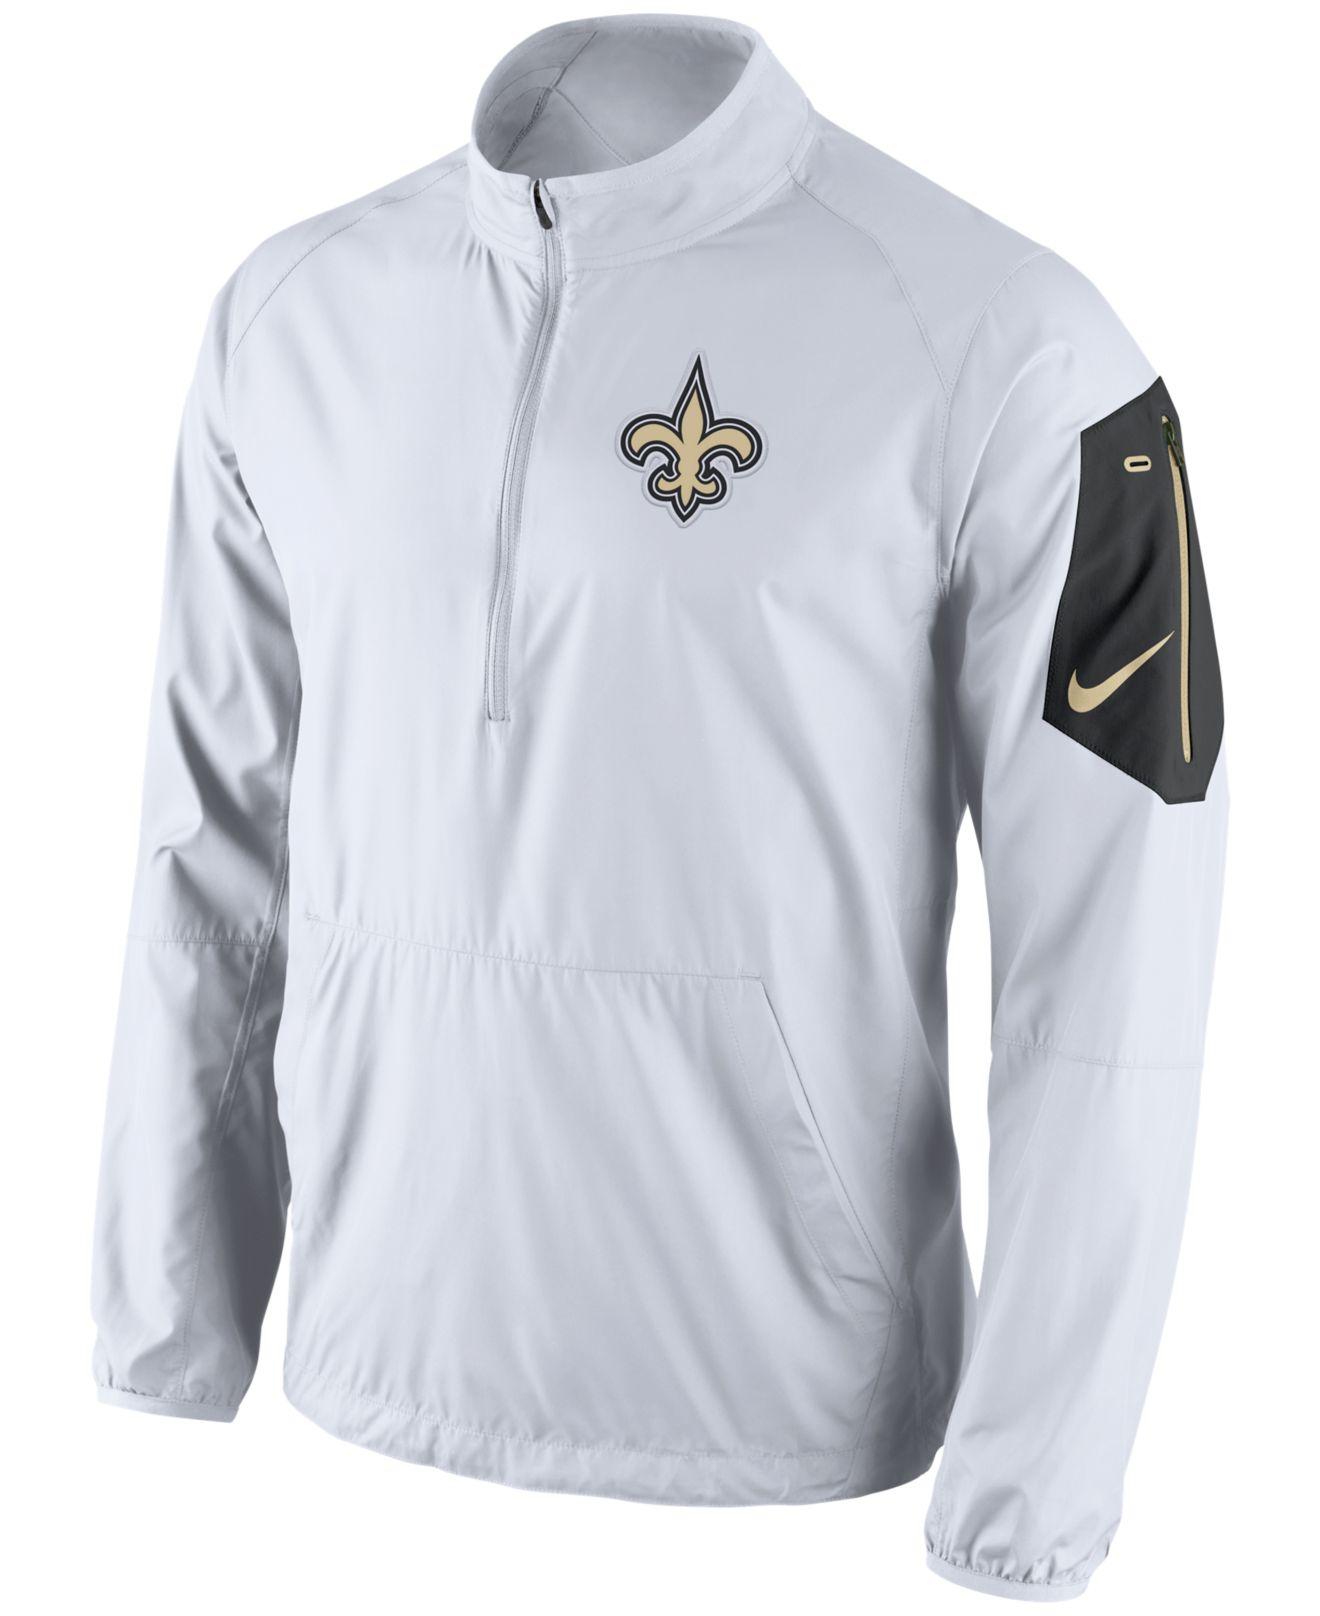 new style 290b4 3bf10 White Men's New Orleans Saints Lockdown Half-zip Jacket